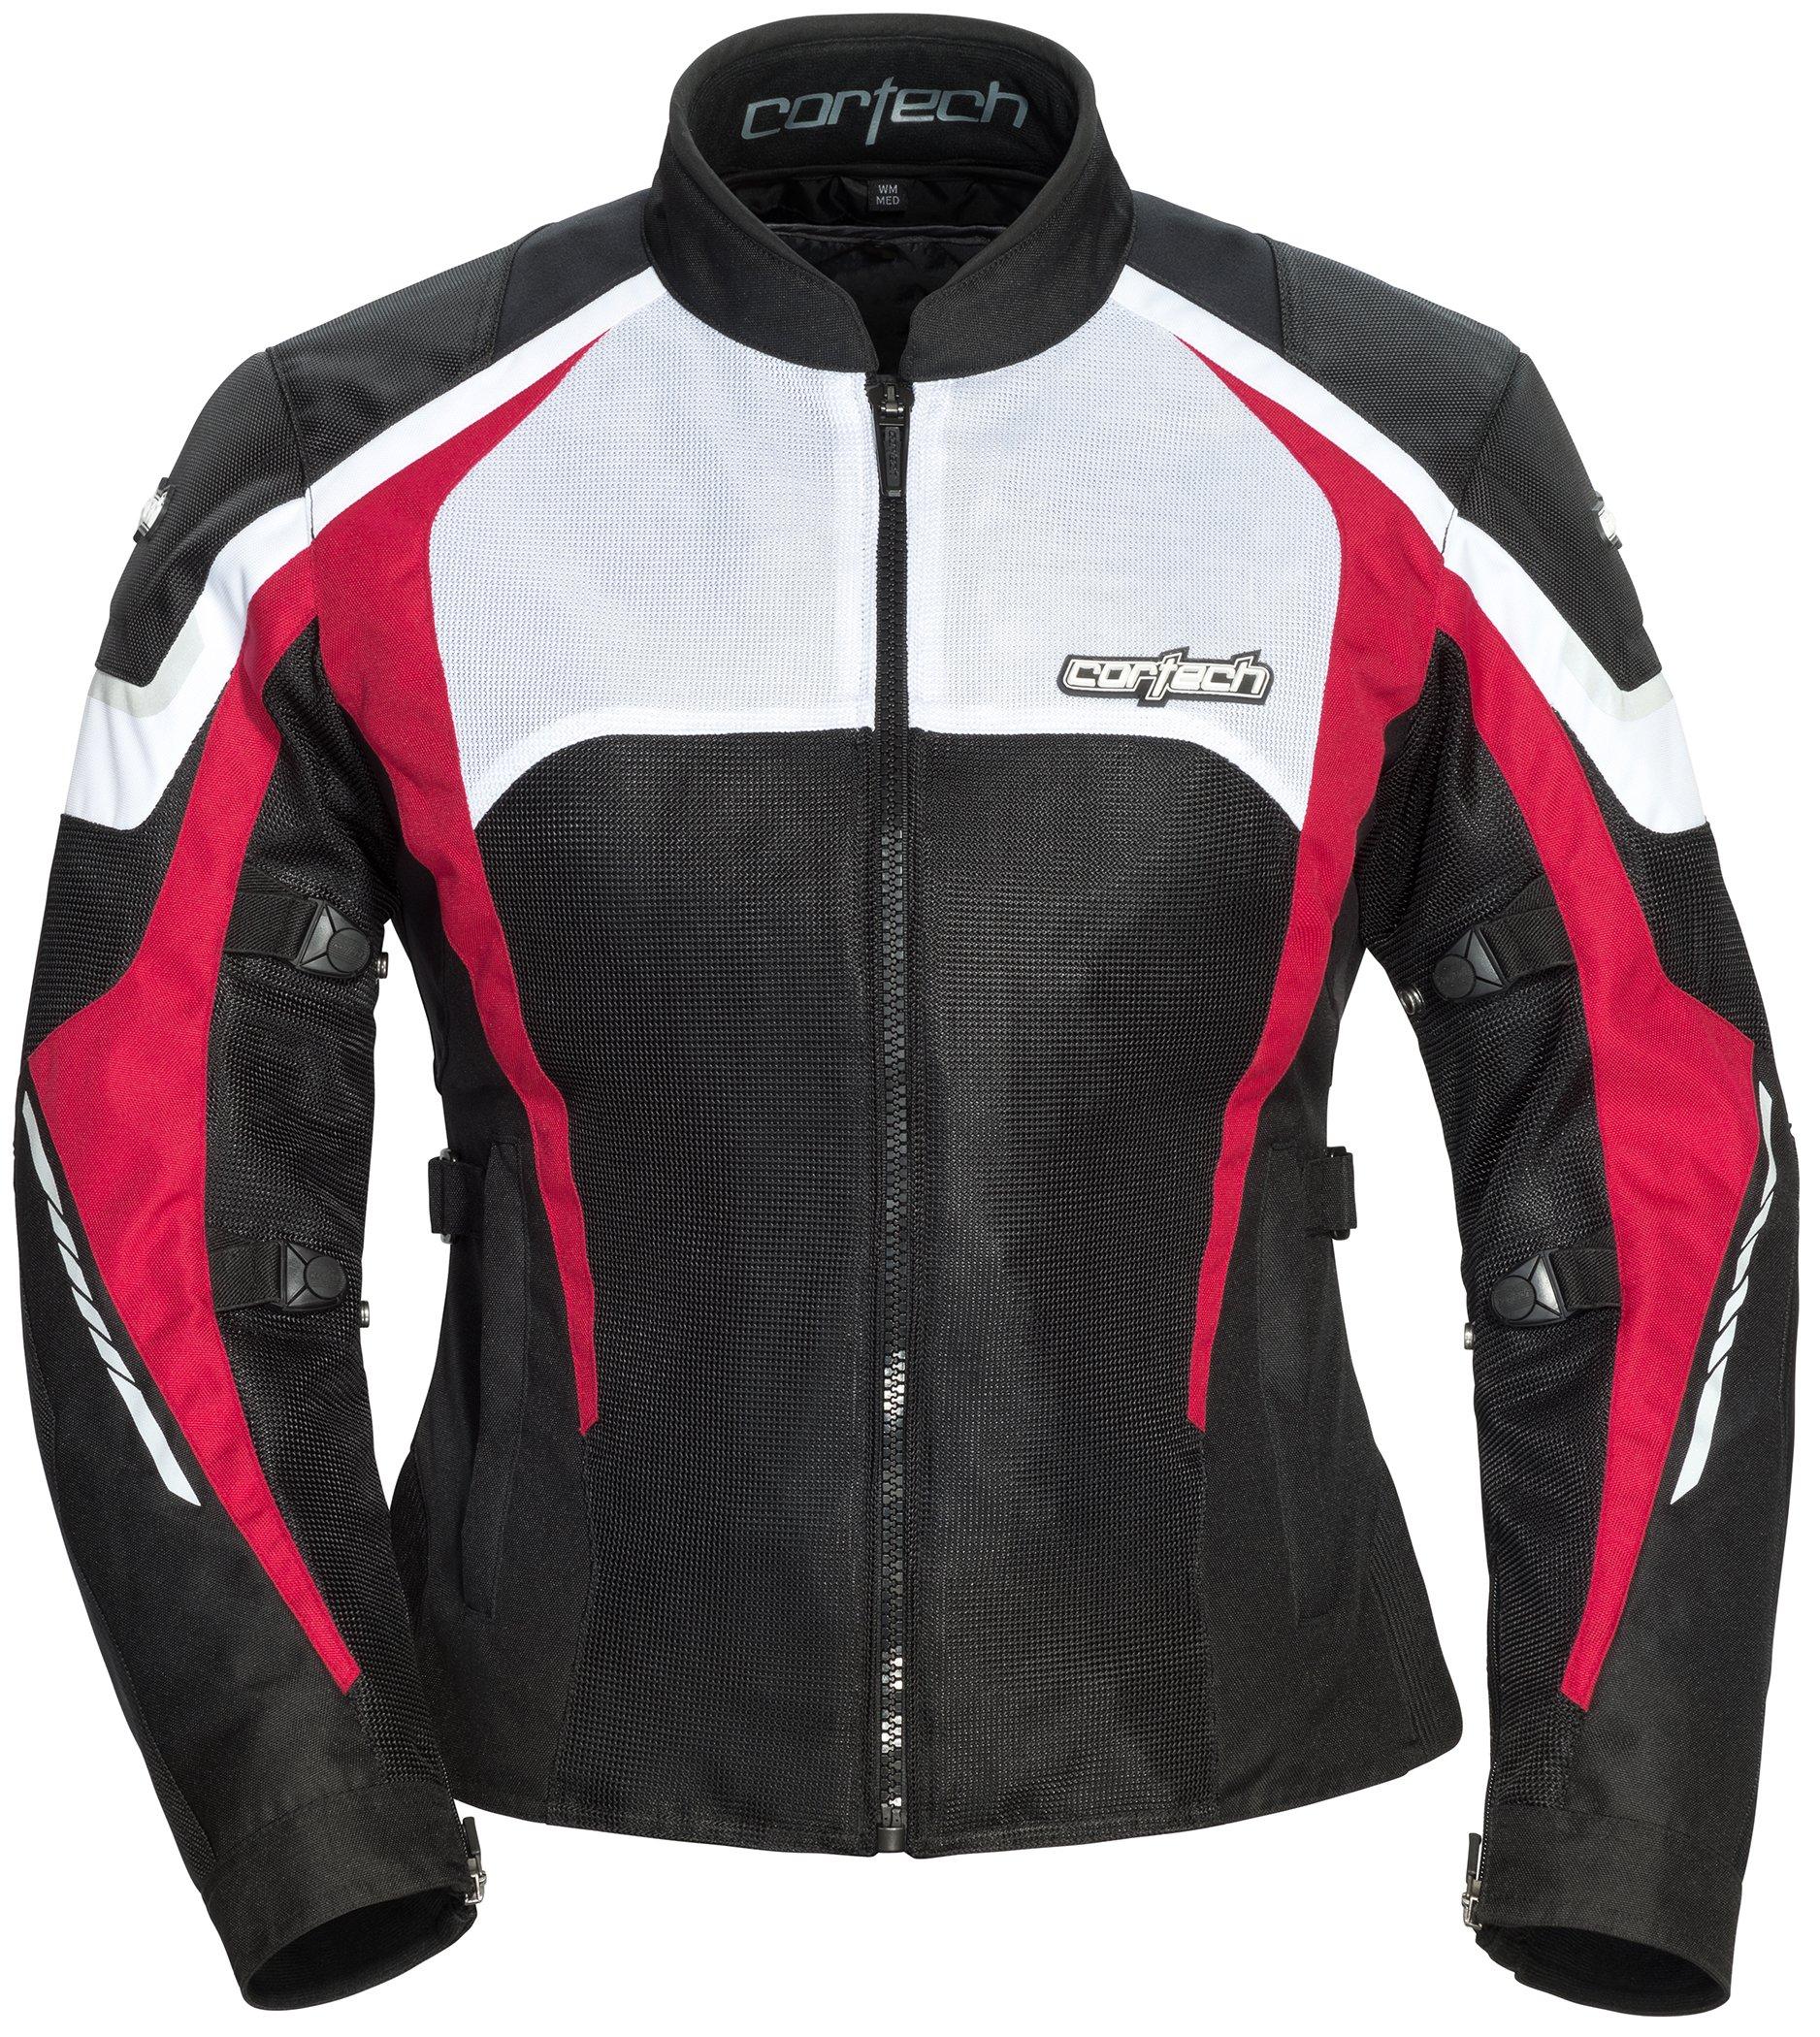 Cortech Women's GX-Sport Air 5.0 Jacket (Black/Pink, Large), 1 Pack